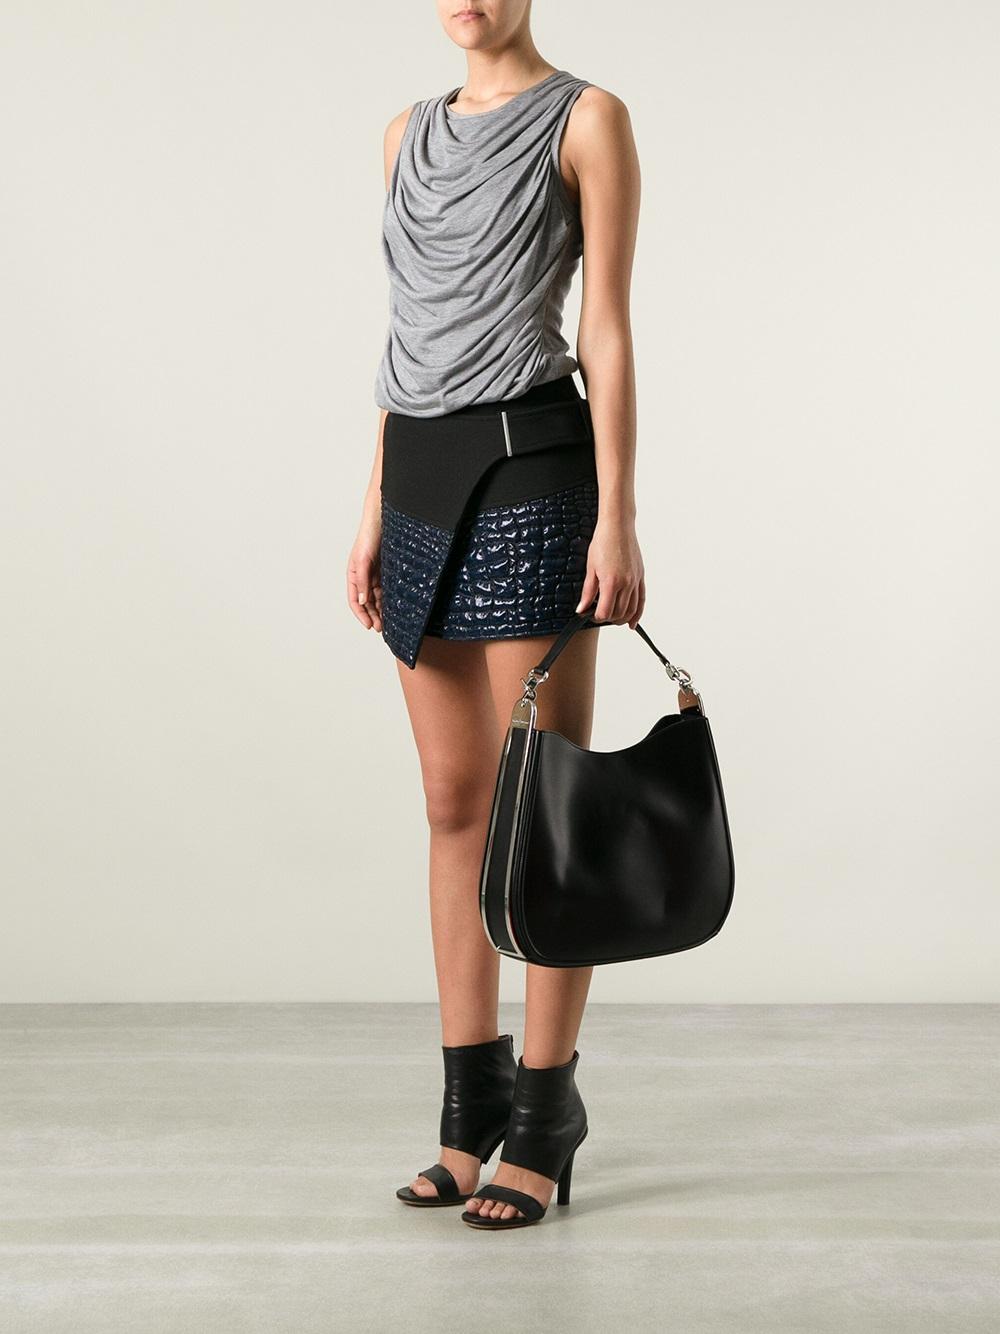 Lyst - Ferragamo Hobo Bag in Black 3d231492fc895